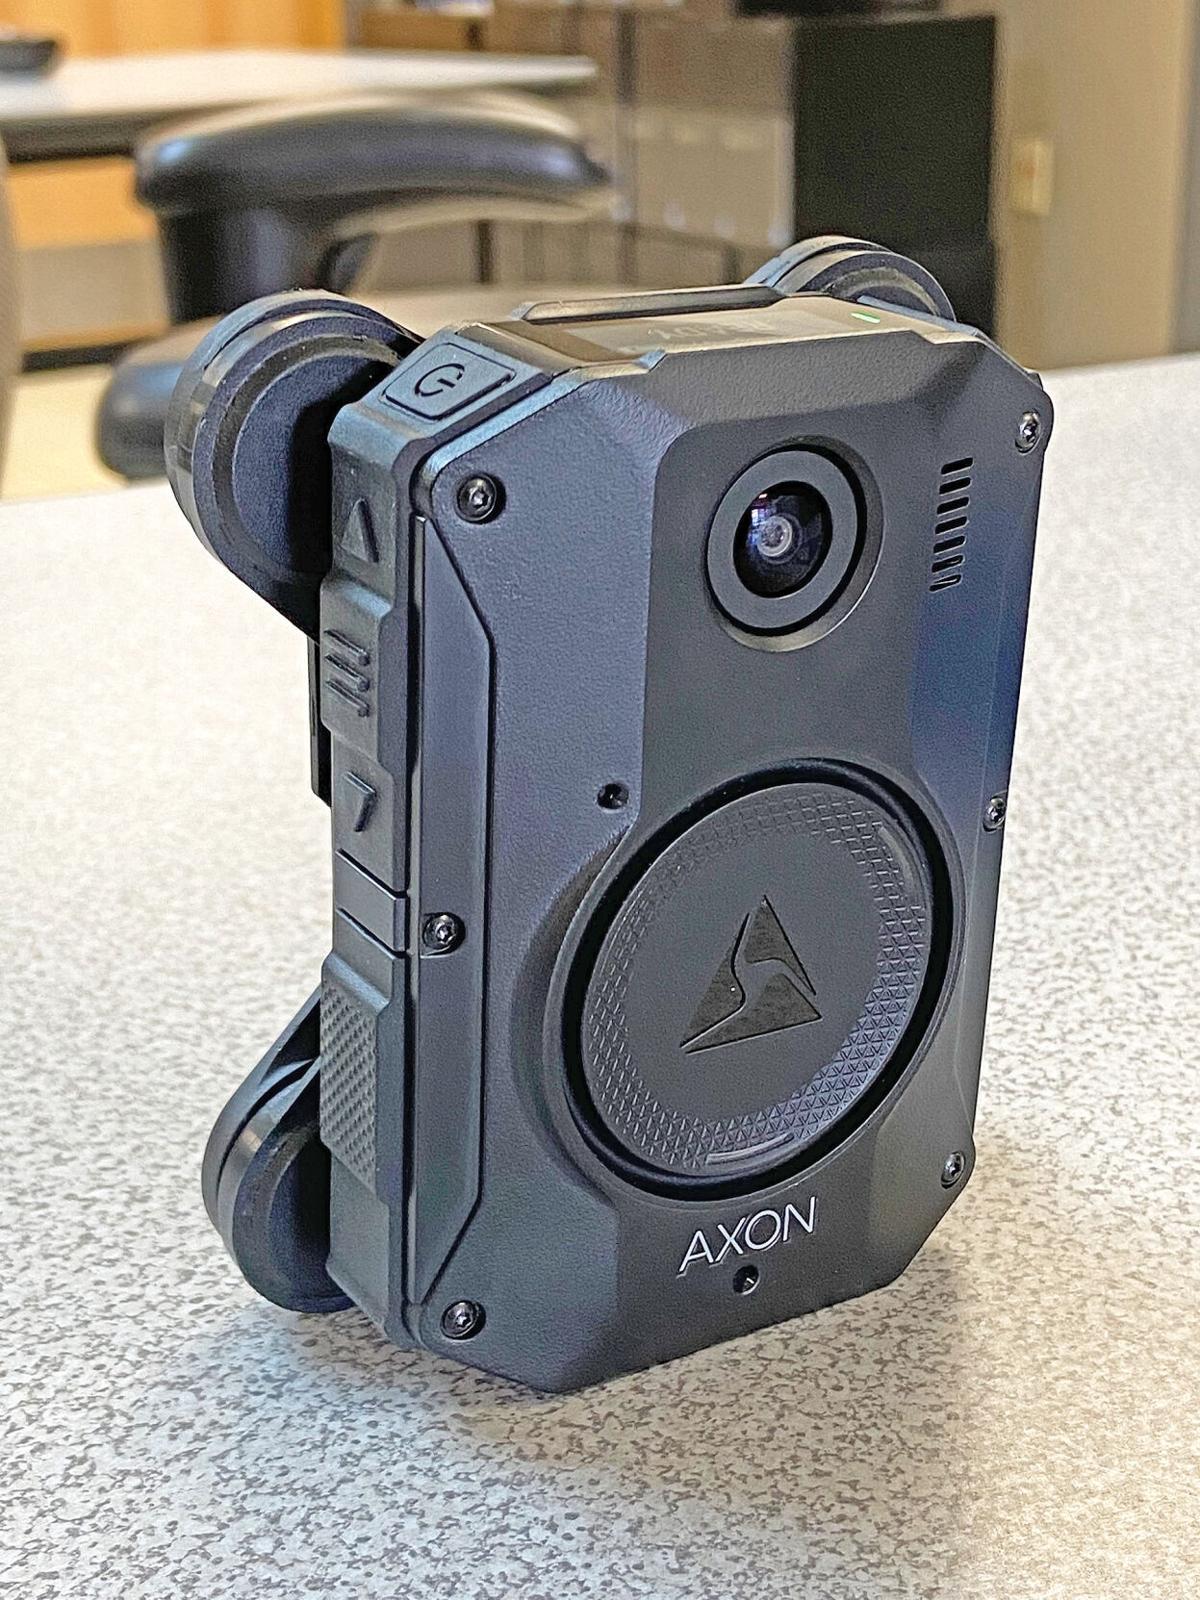 bodycam2